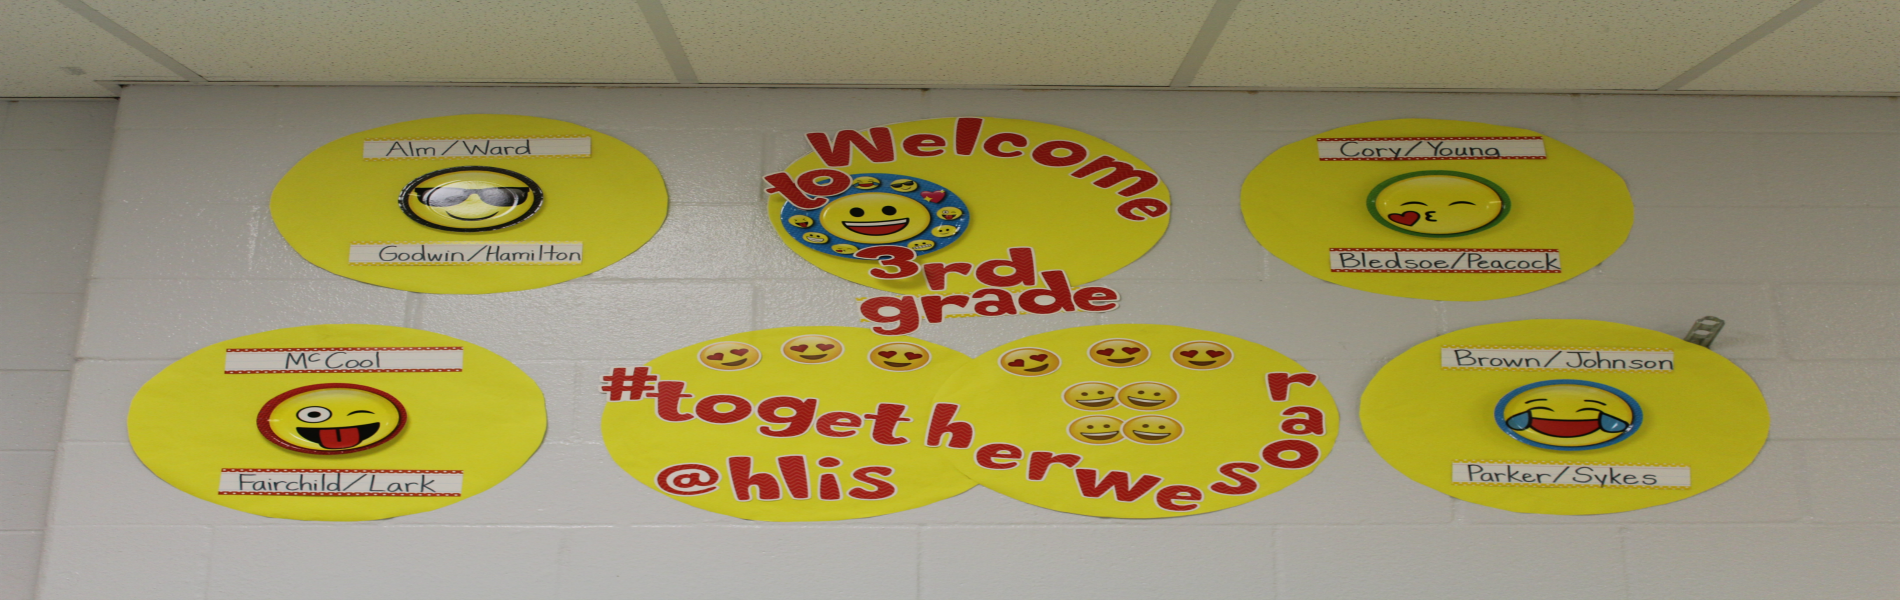 3rd grade emojis